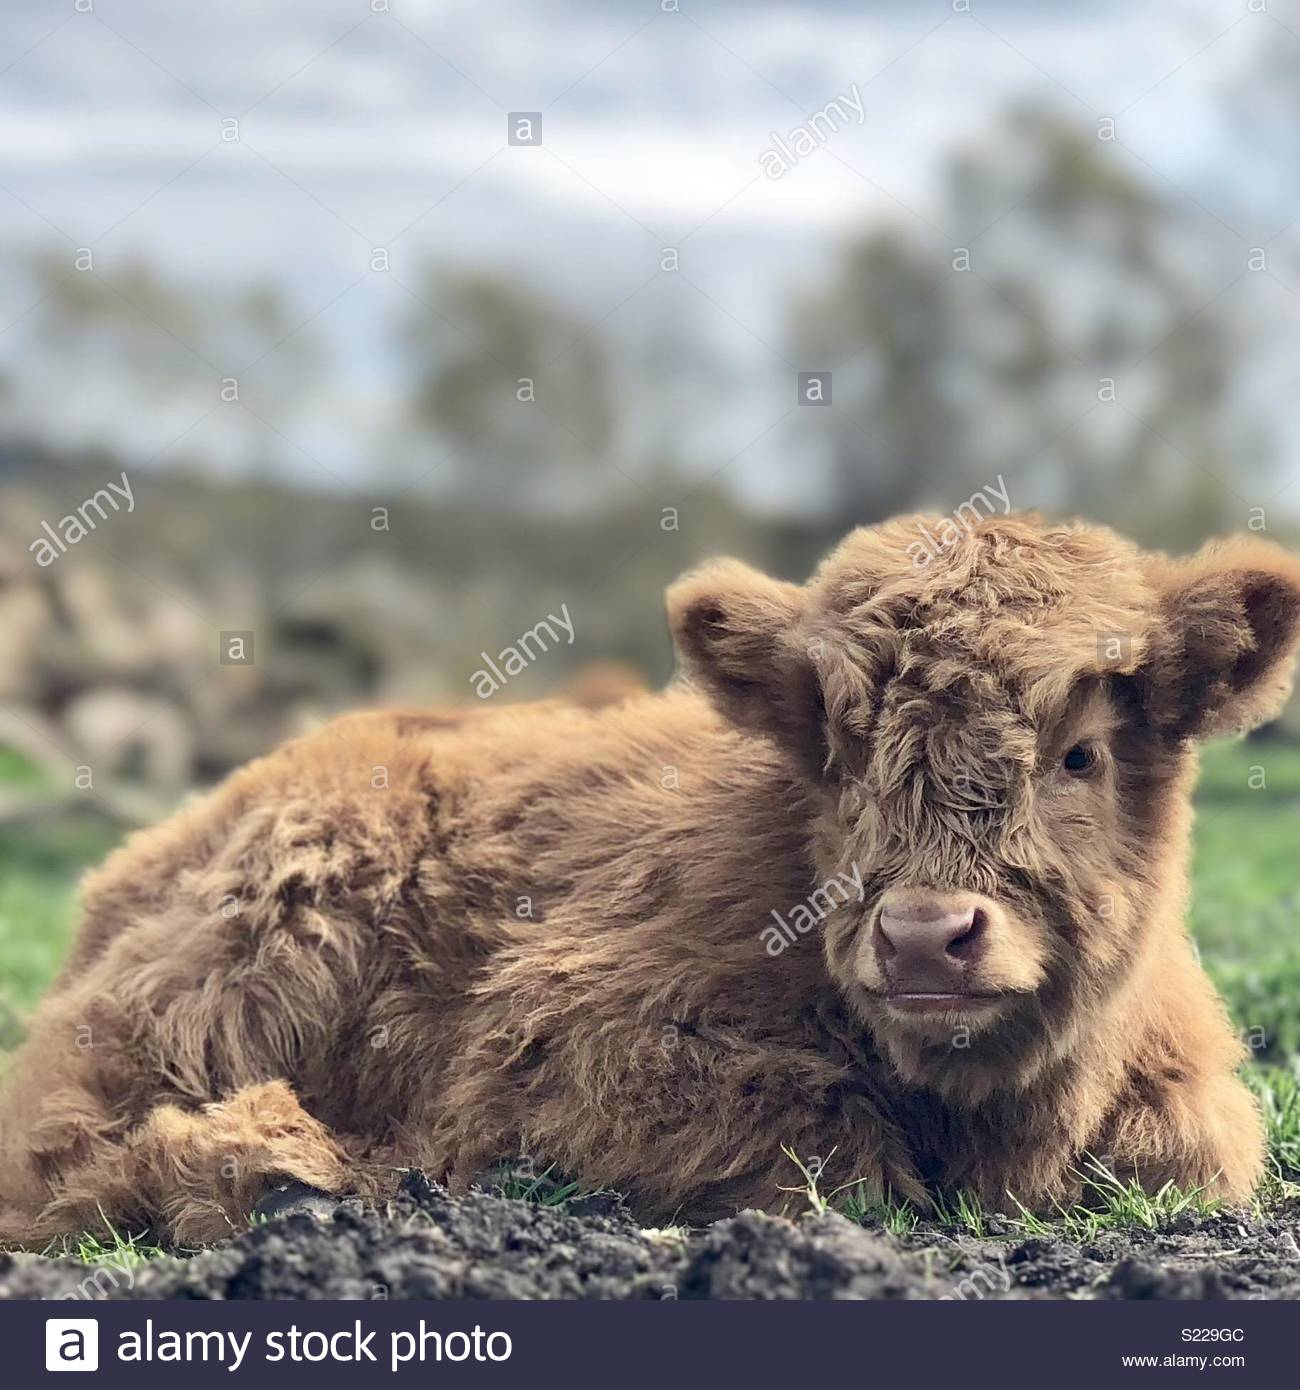 Highland cattle calf - Bos taurus - Stock Image